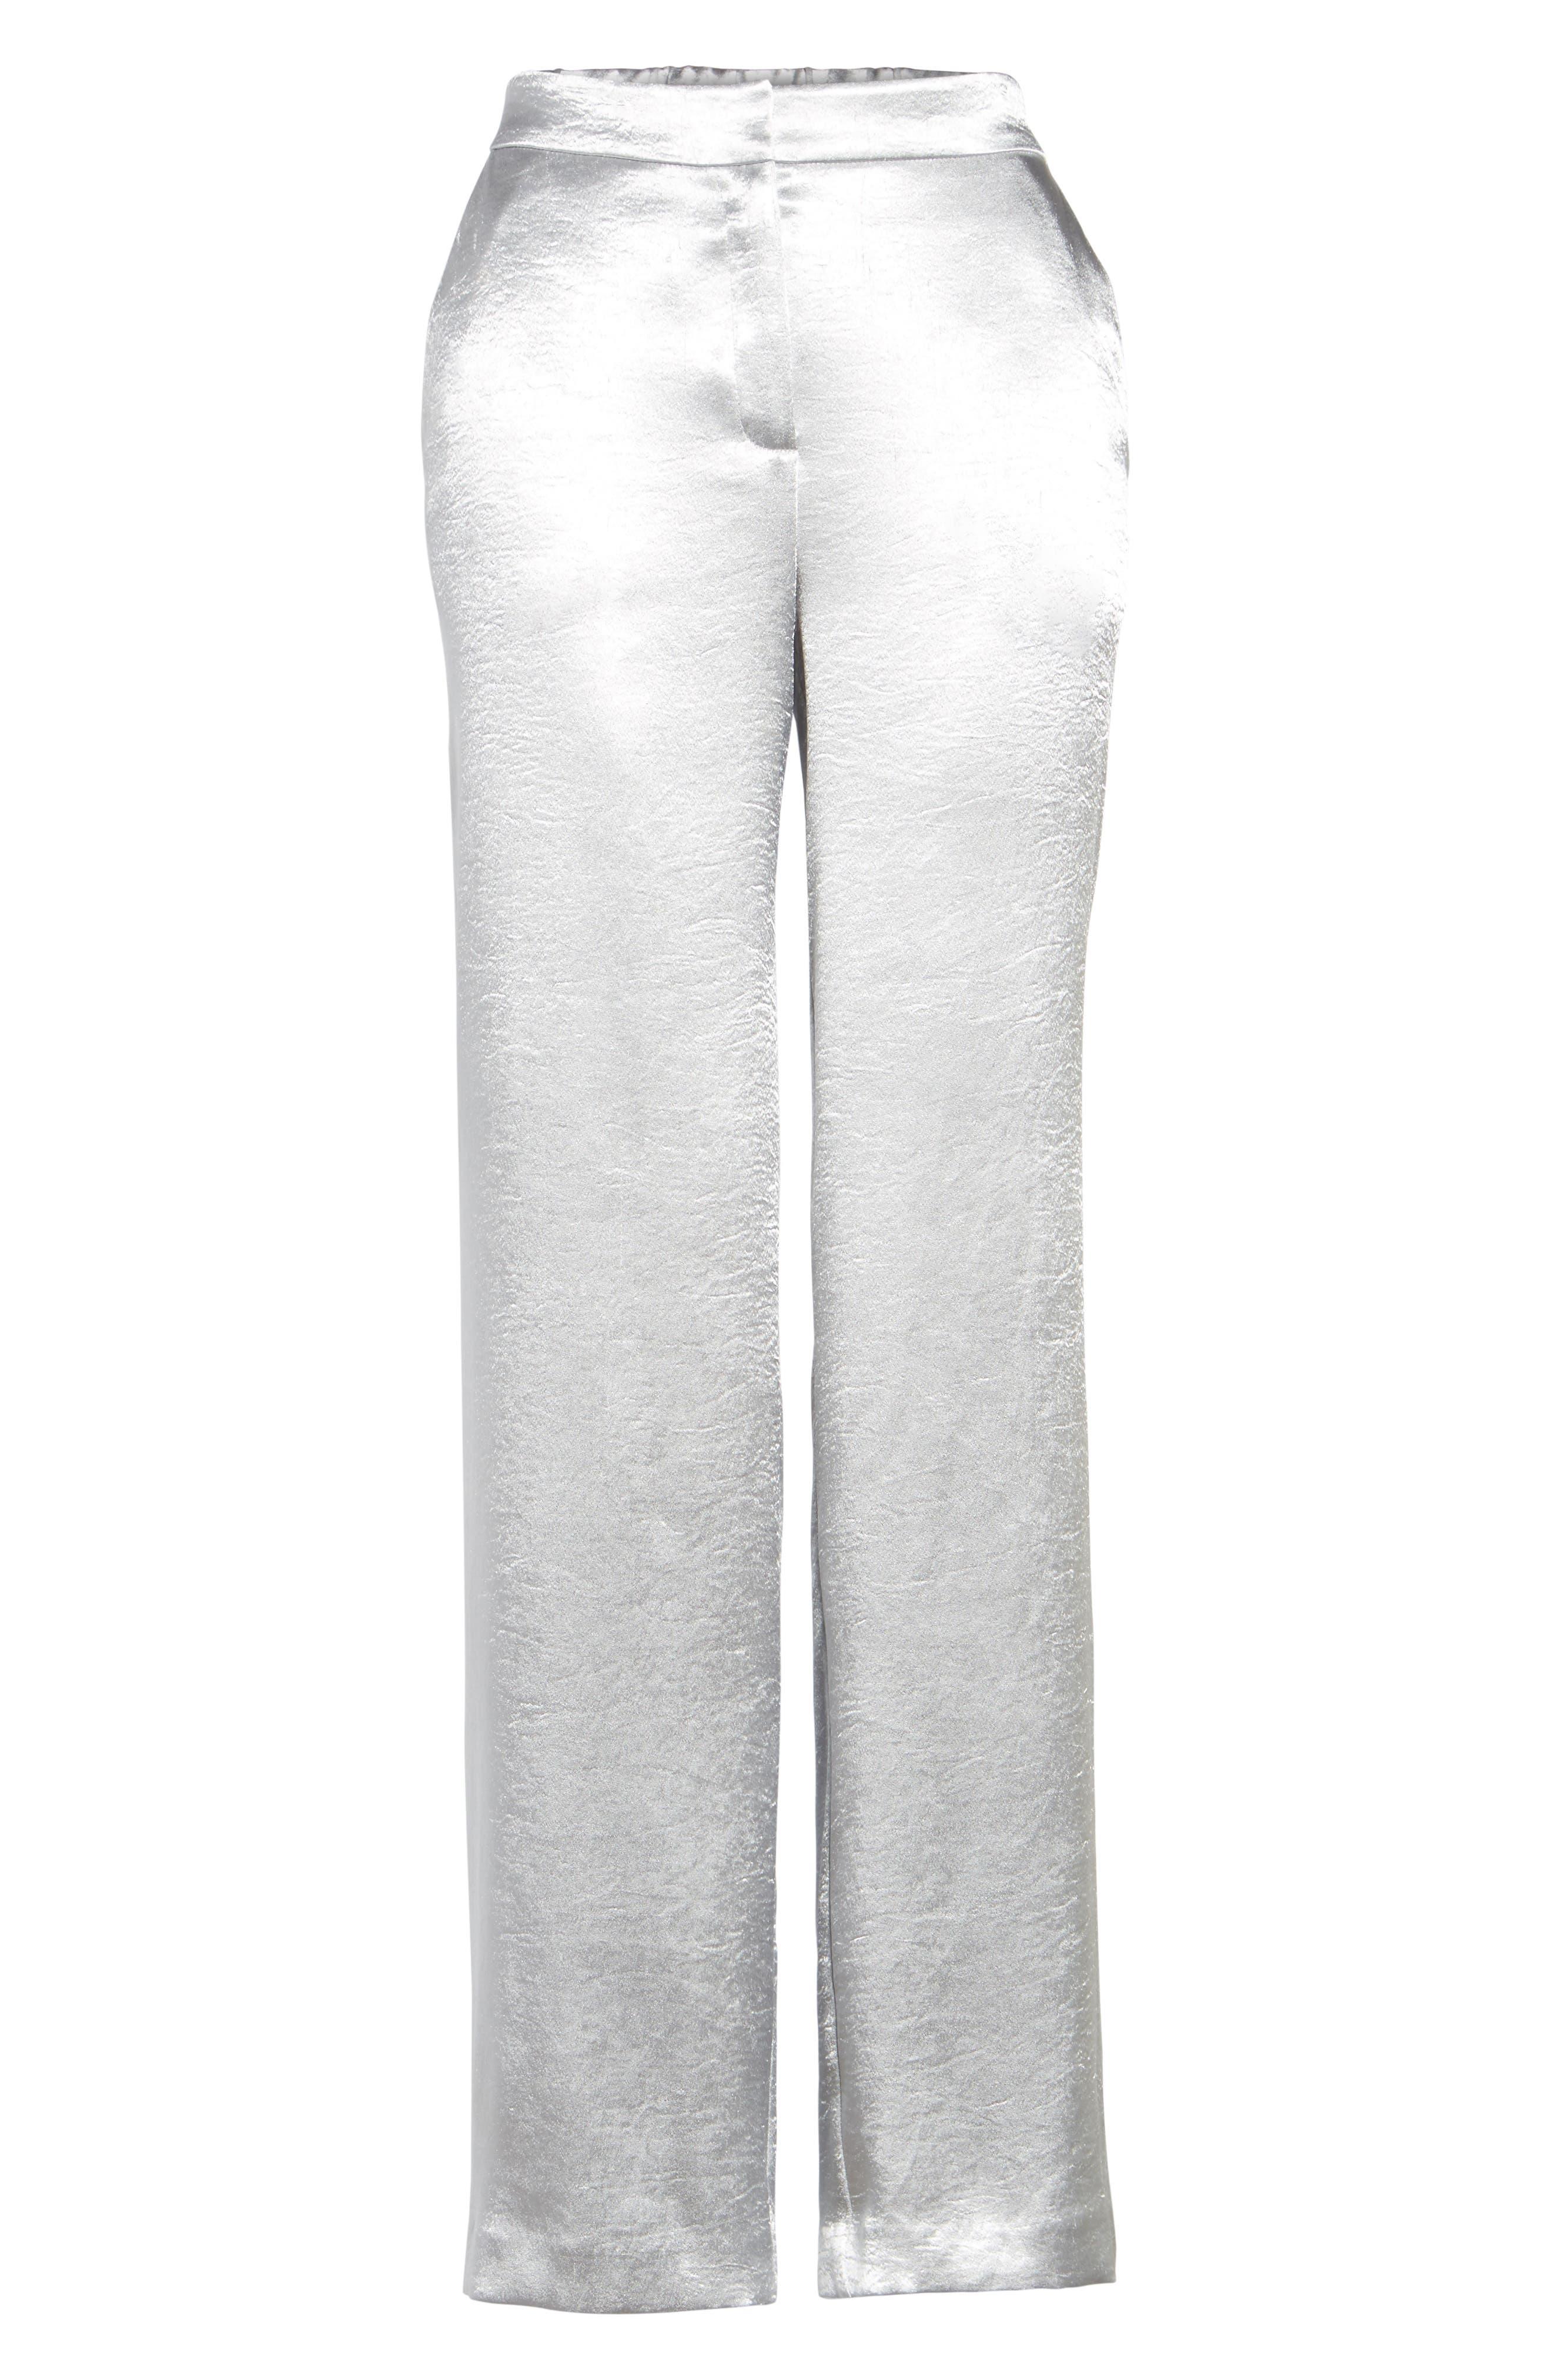 Wide Leg Hammered Satin Pants,                             Alternate thumbnail 6, color,                             045